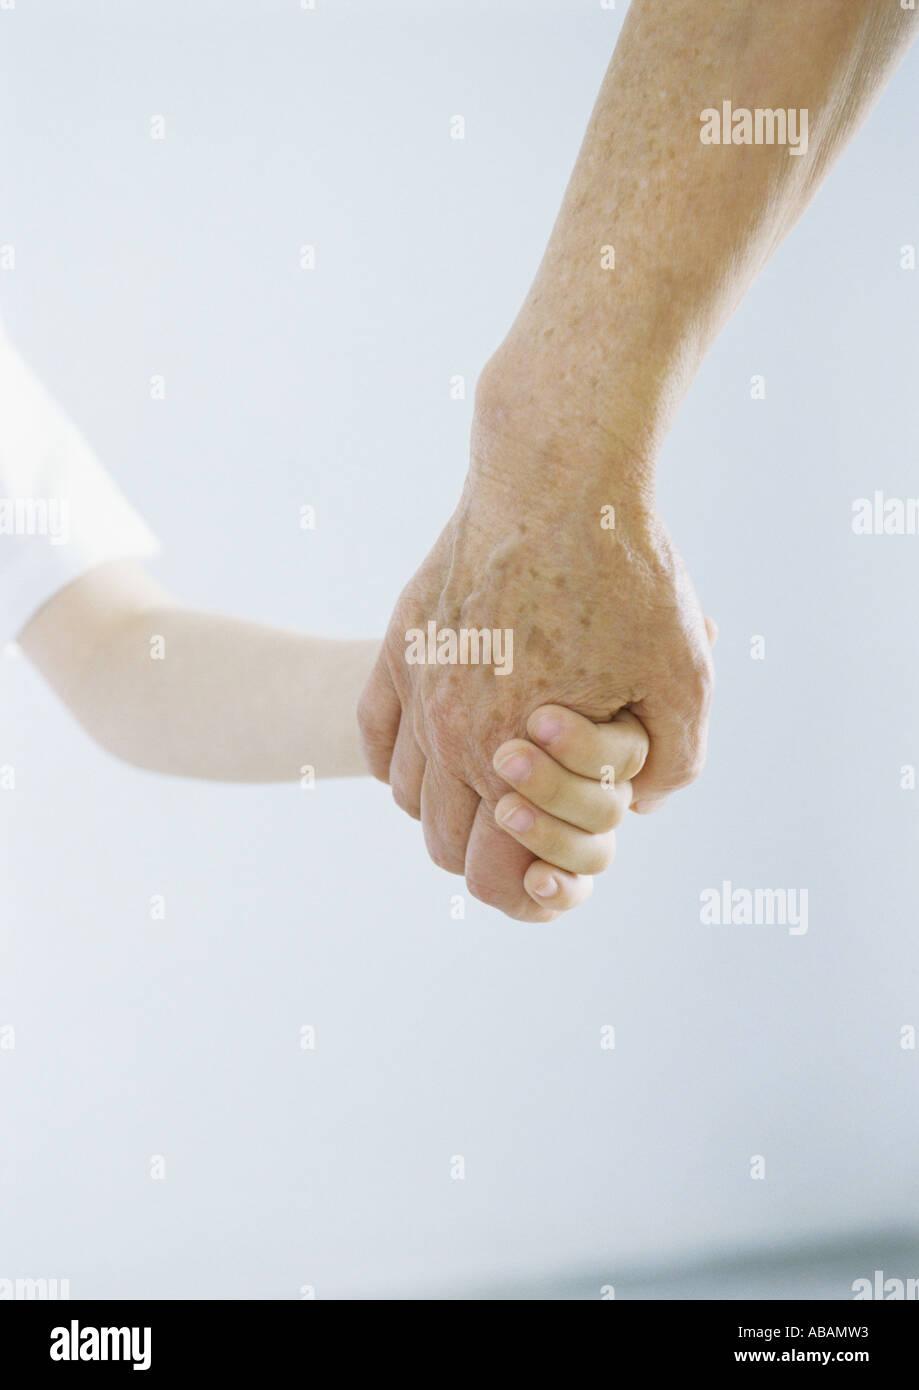 Enfant tenant la main de grand-parent Photo Stock